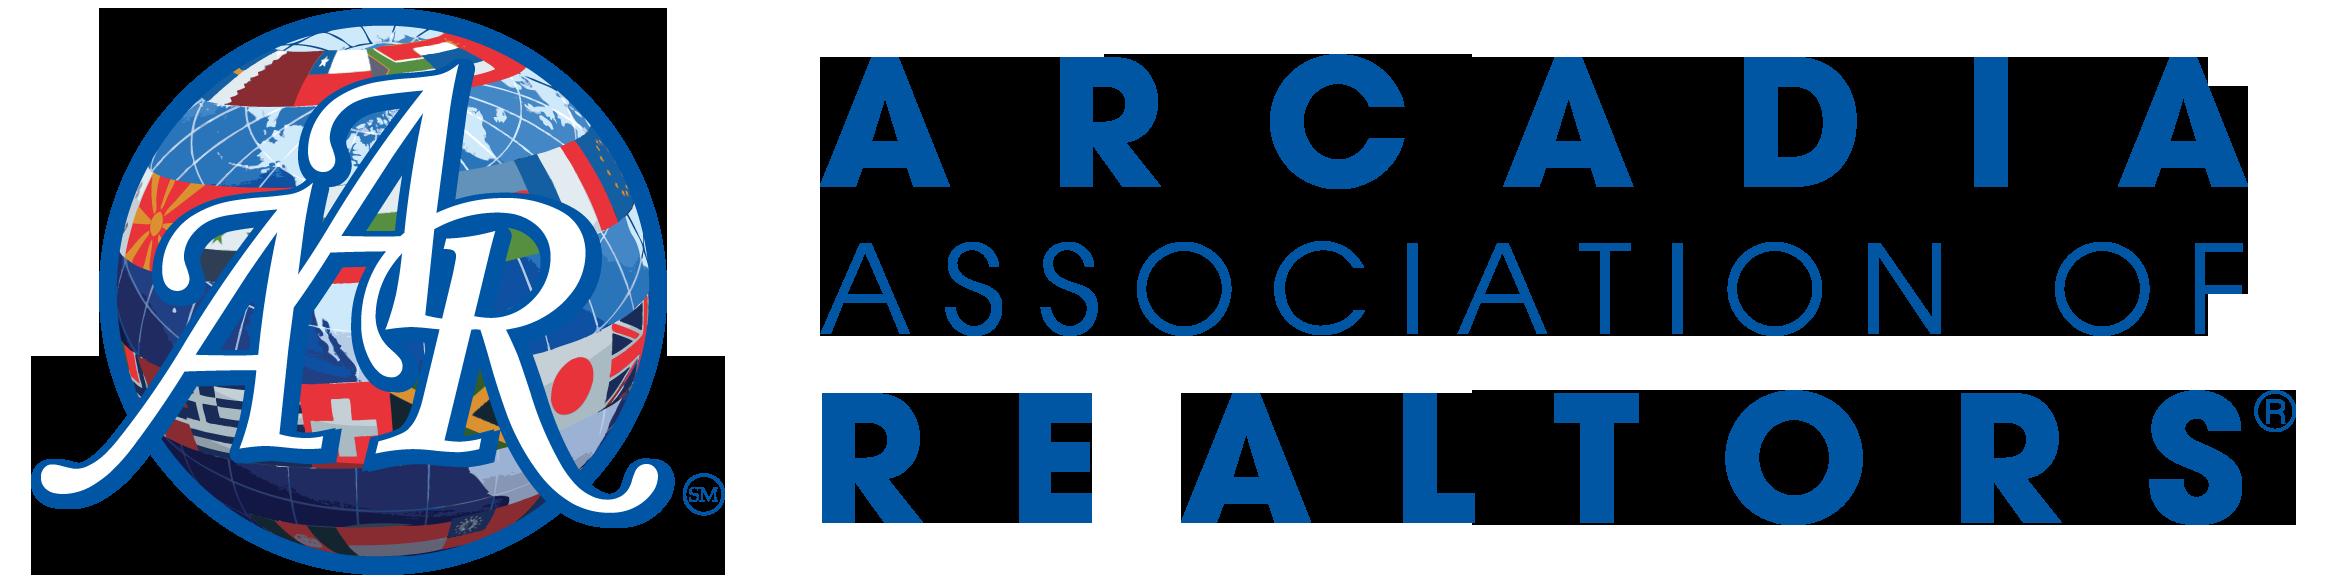 Arcadia Association of Realtors